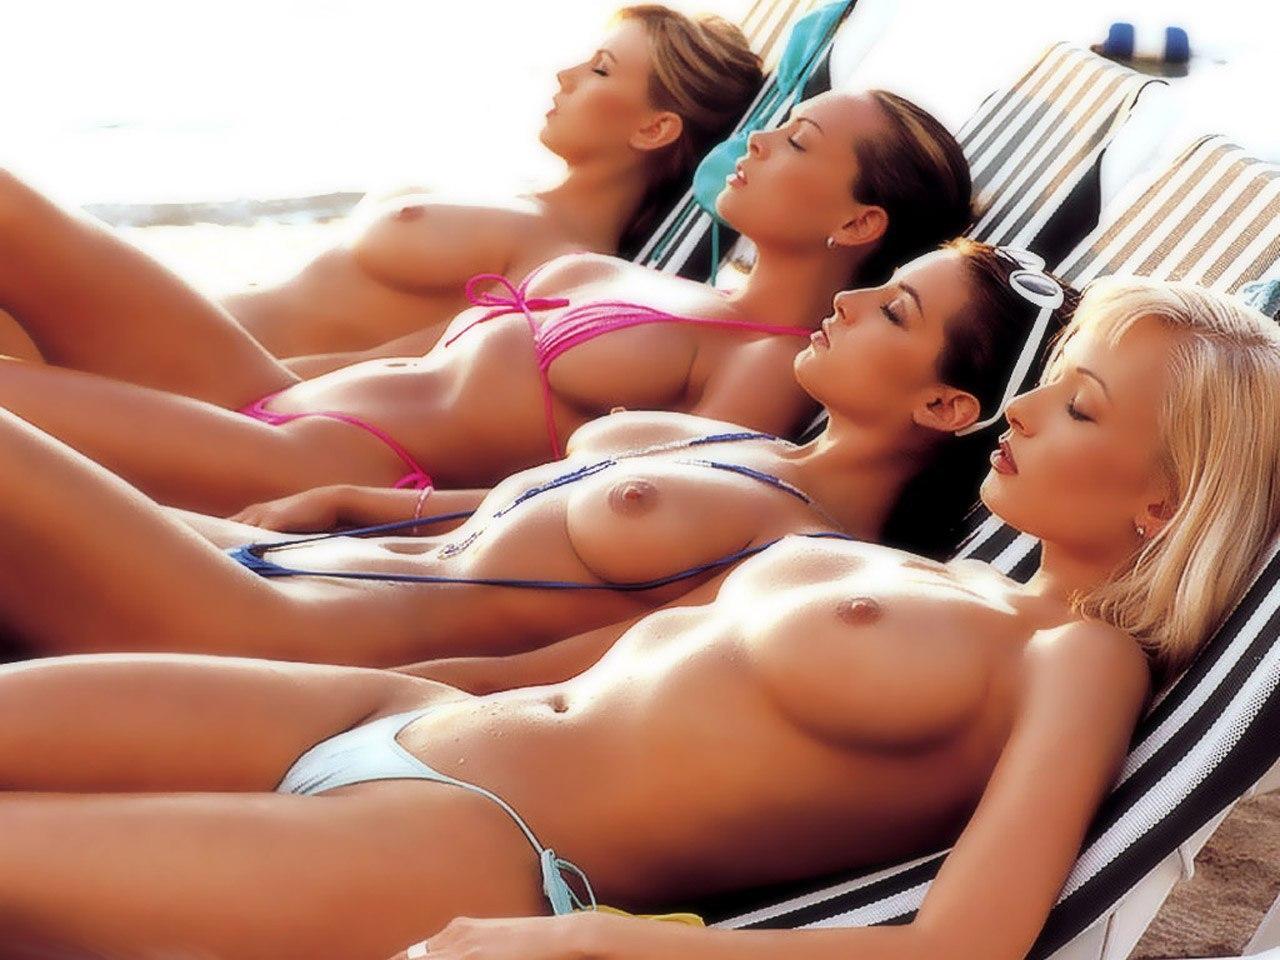 Free pics of hot naked lesbians